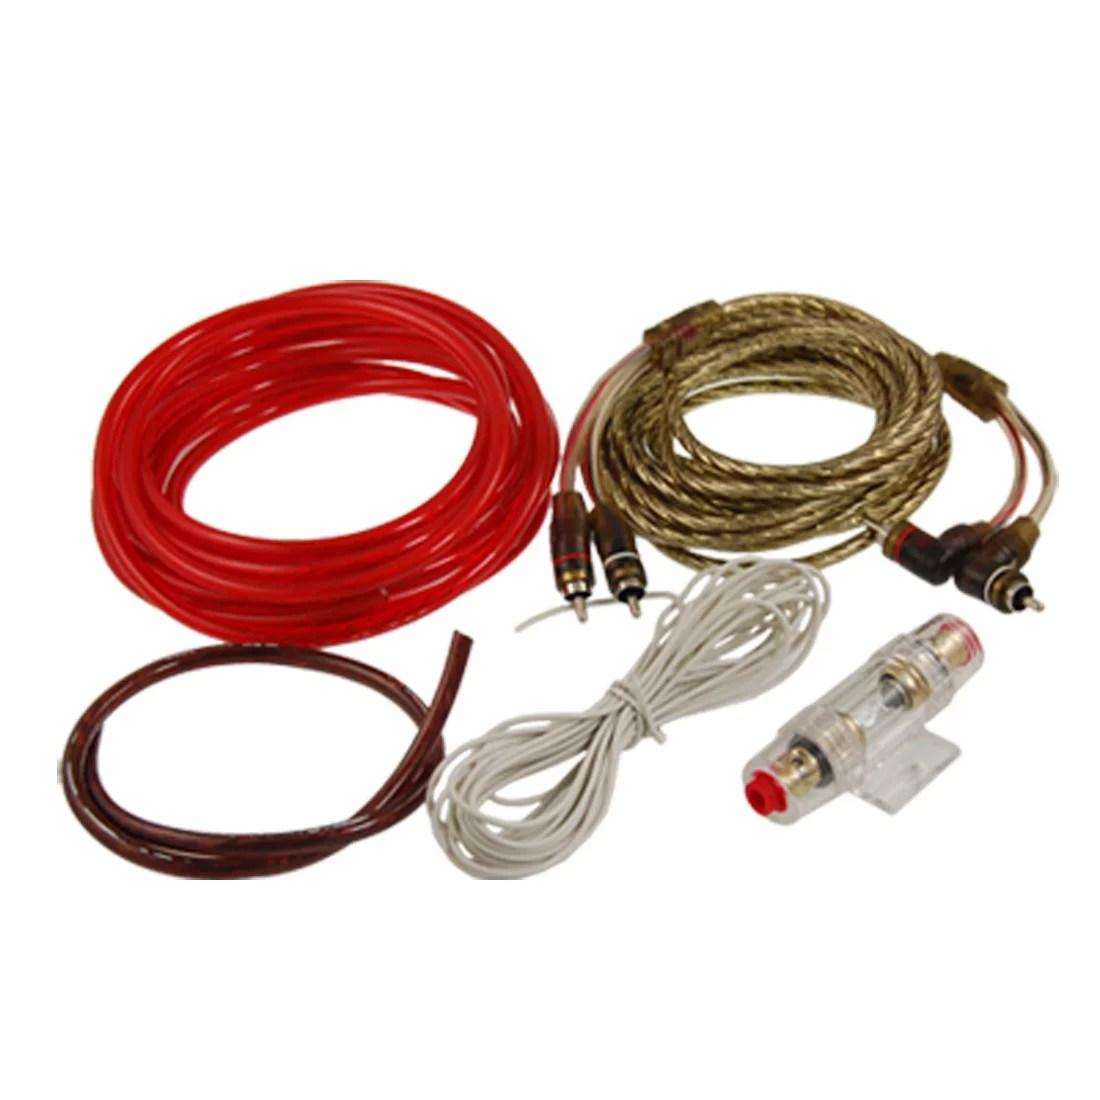 car audio 4 pcs cables fuse holder amplifier wiring kit walmart com audio amplifier kit car audio wiring kit walmart [ 1100 x 1100 Pixel ]